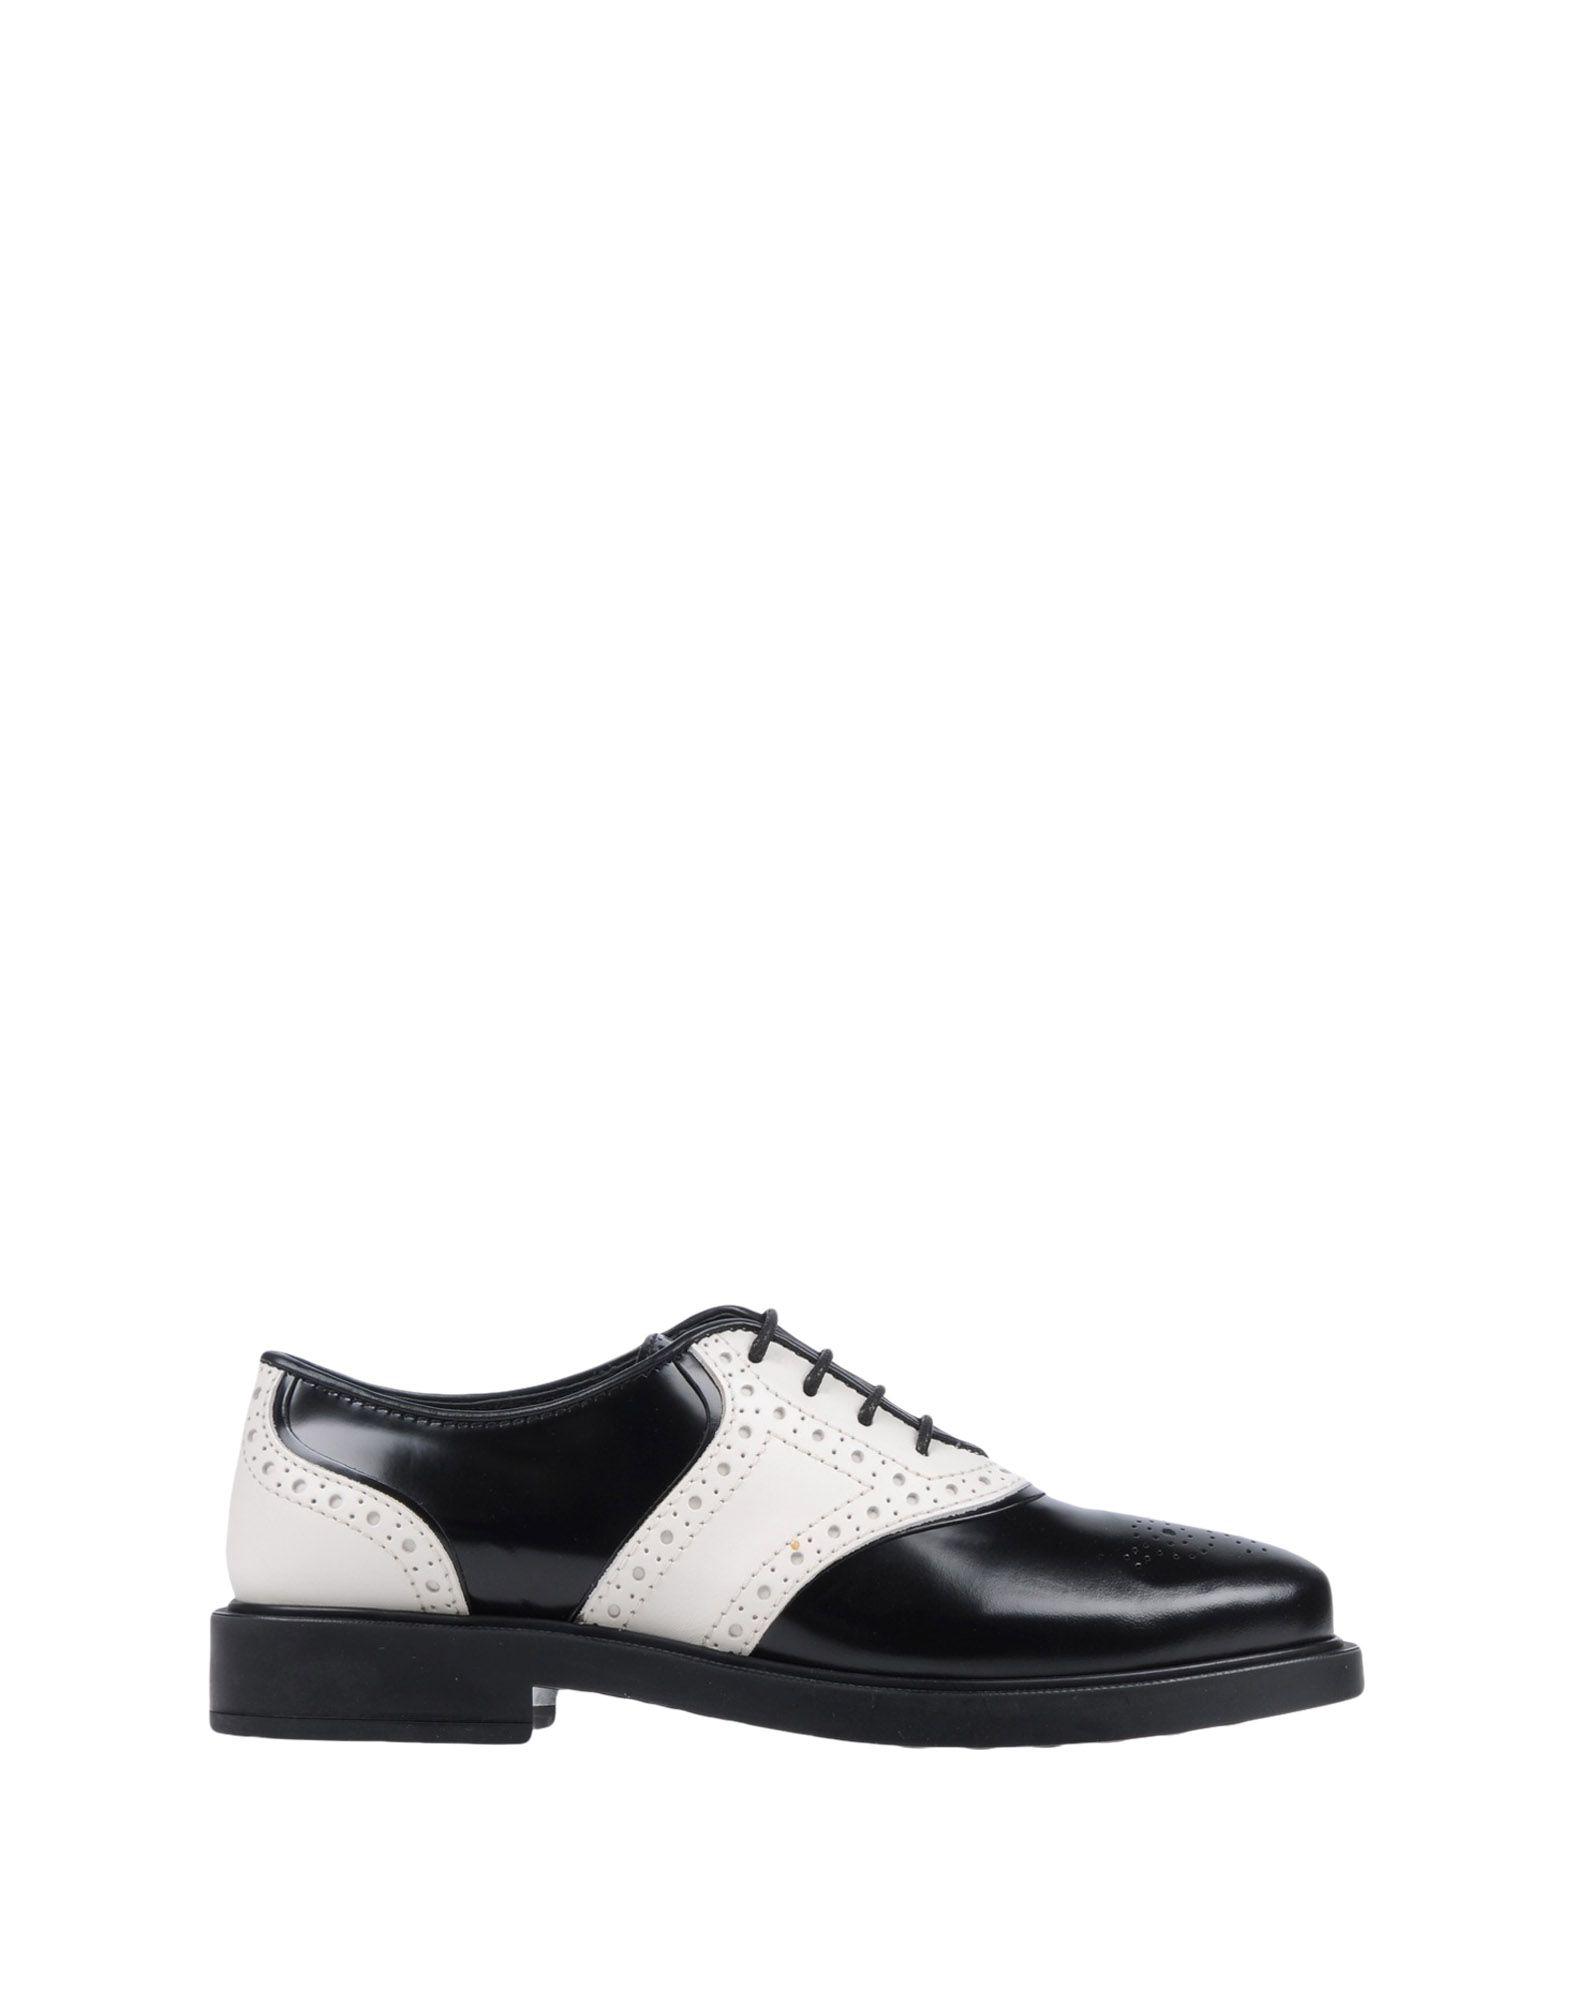 Haltbare Mode billige Schuhe Tod's Schnürschuhe Damen  11452149SH Heiße Schuhe